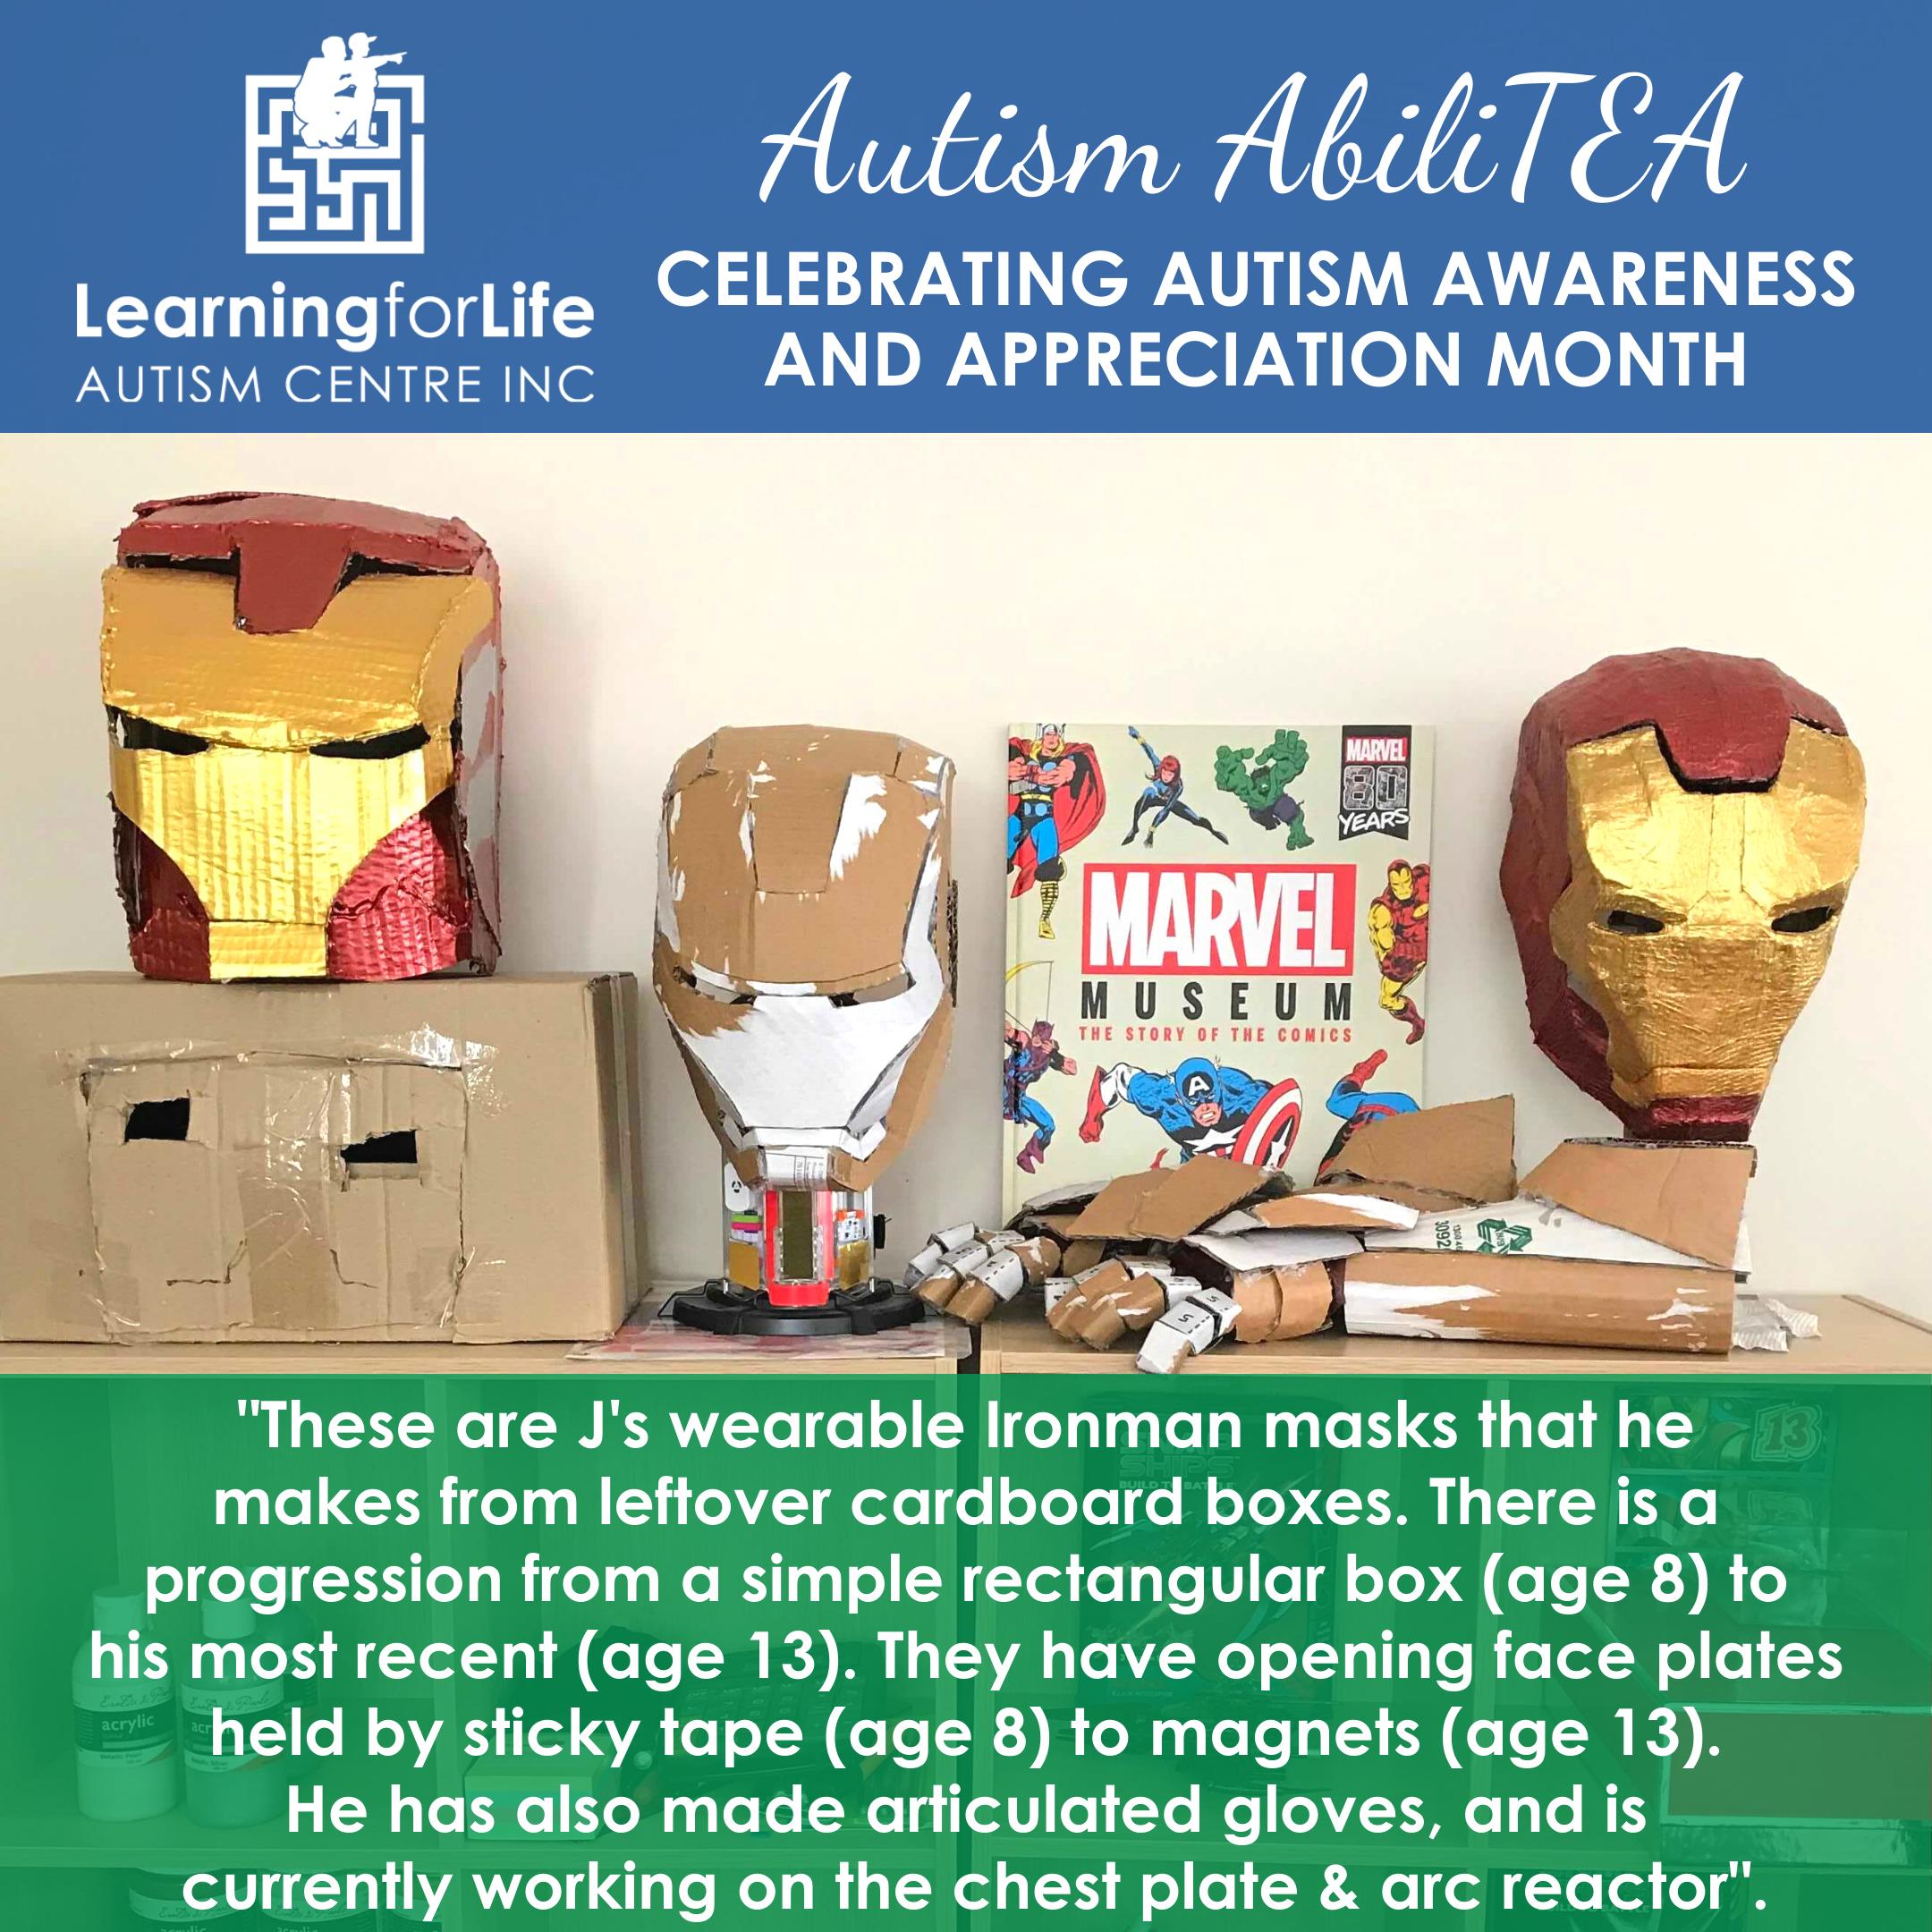 2021 L4Life's Autism AbiliTEA - ironman masks